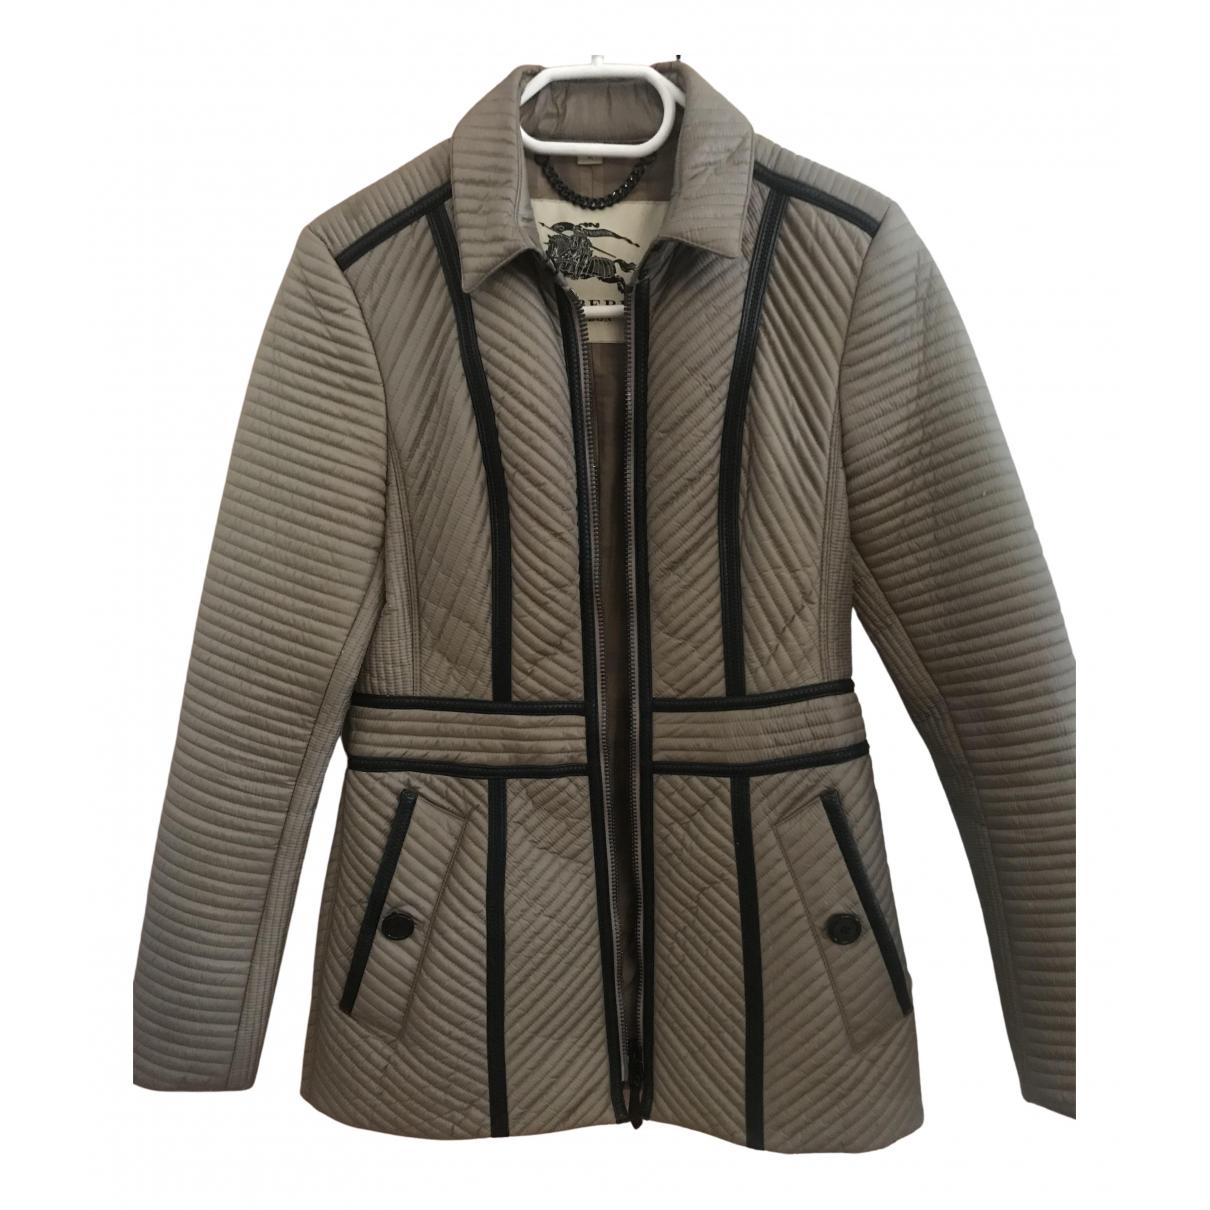 Burberry N Brown jacket for Women M International